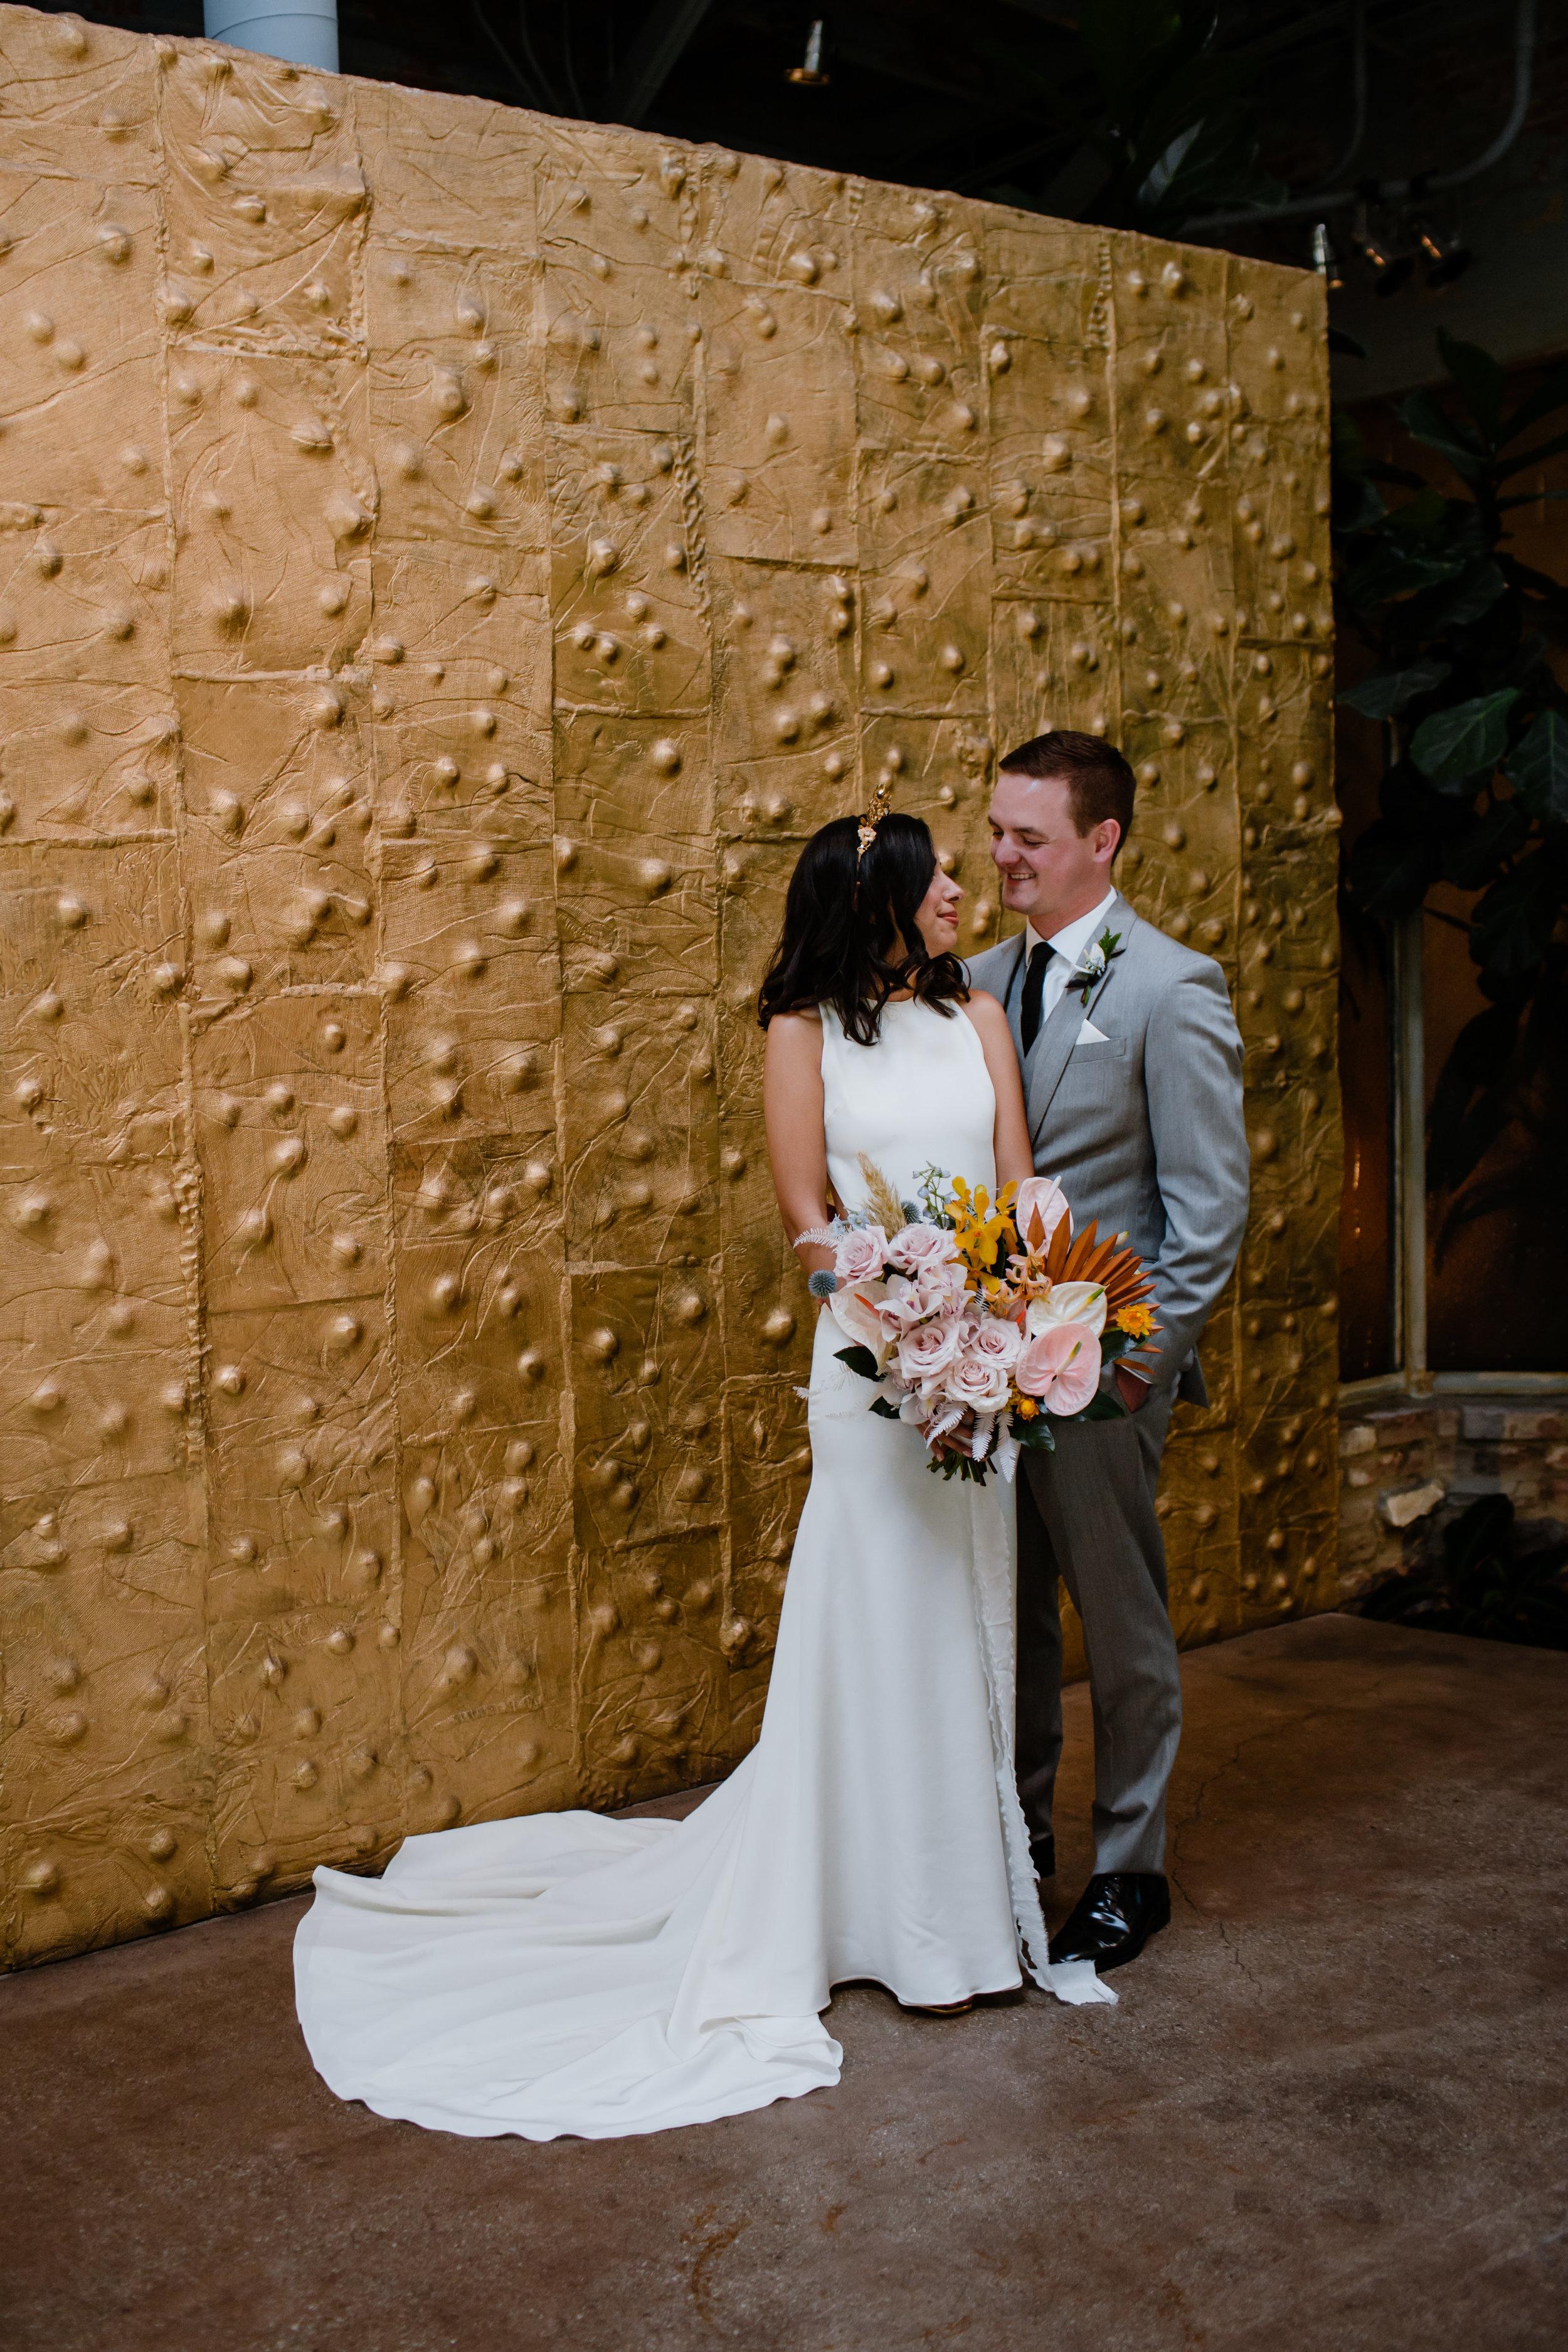 Sharon and Adam Downtown Los Angeles Arts District Wedding Millwick Venue - Eve Rox Photography-233.jpg